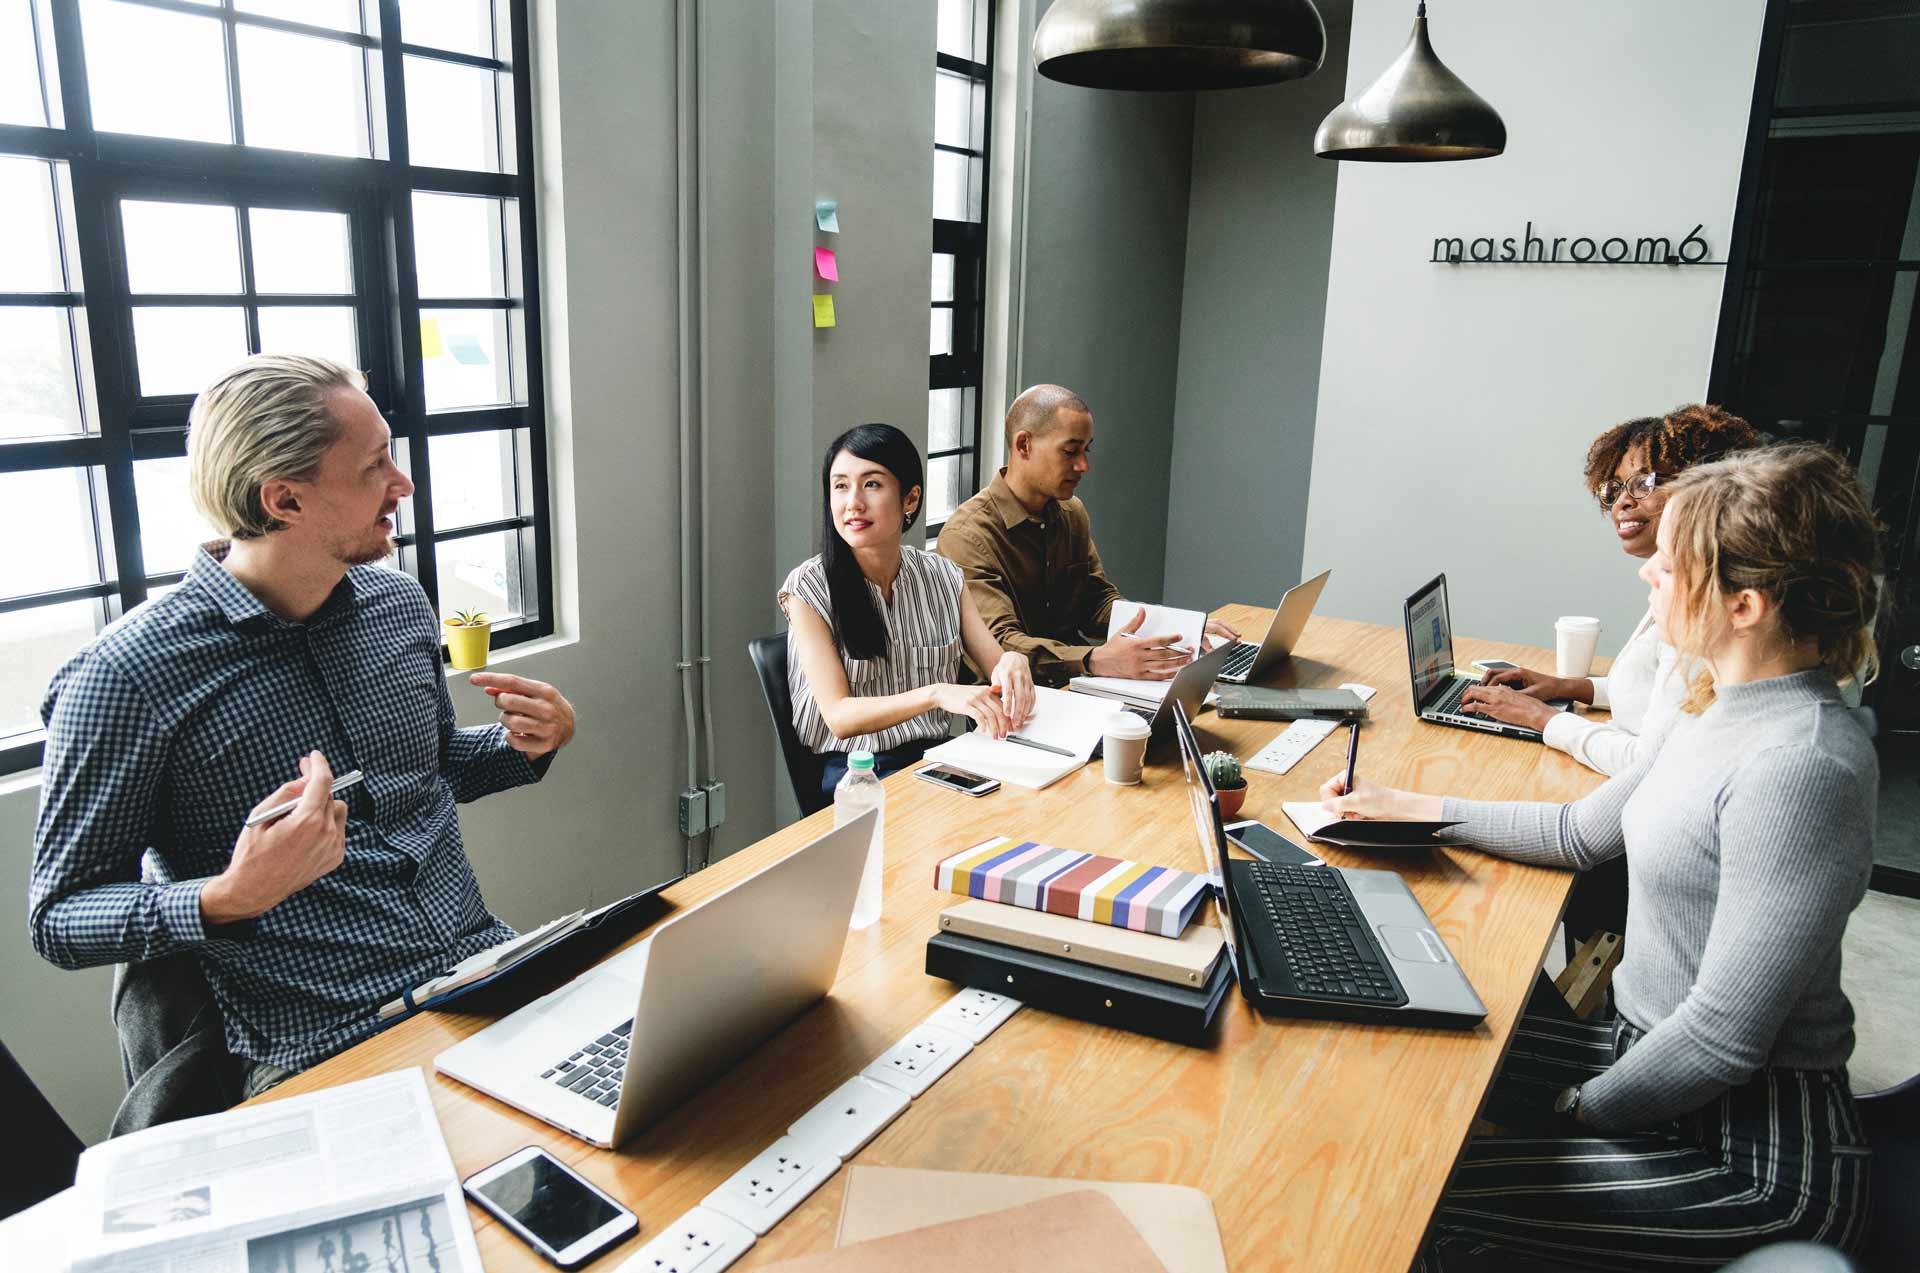 brainstorming-collaboration-colleague